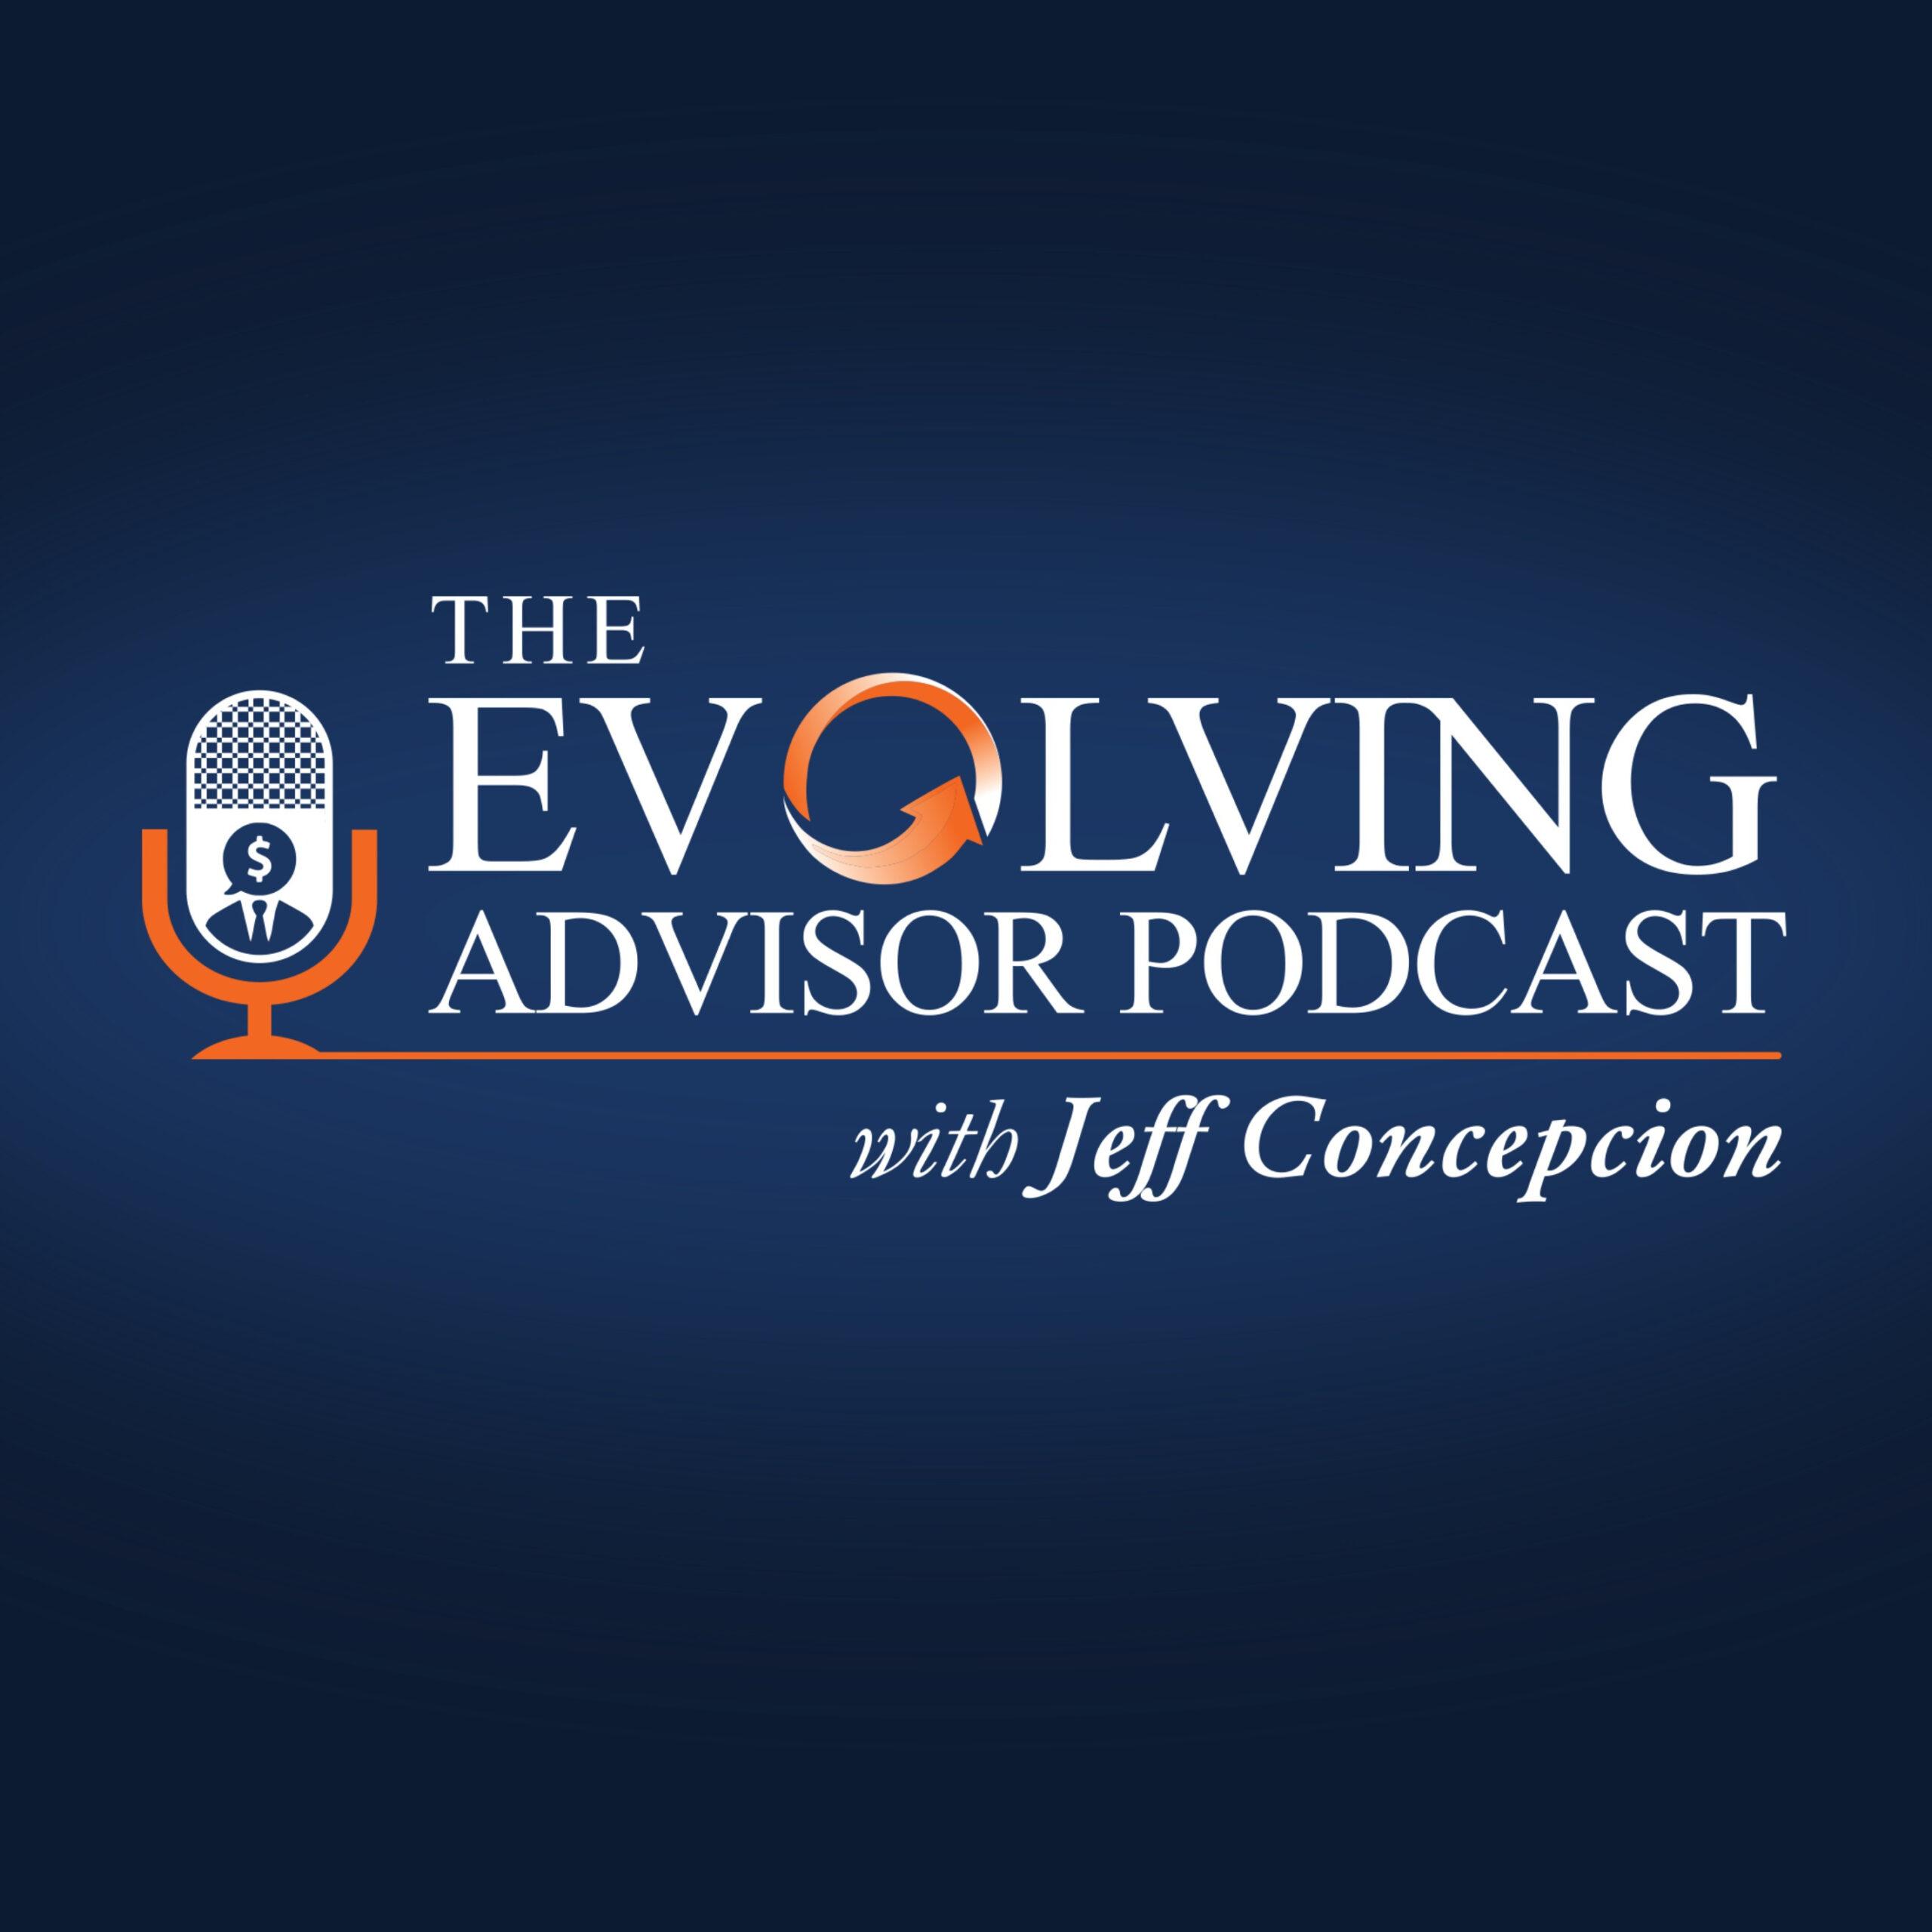 The Evolving Advisor Podcast with Jeff Concepcion